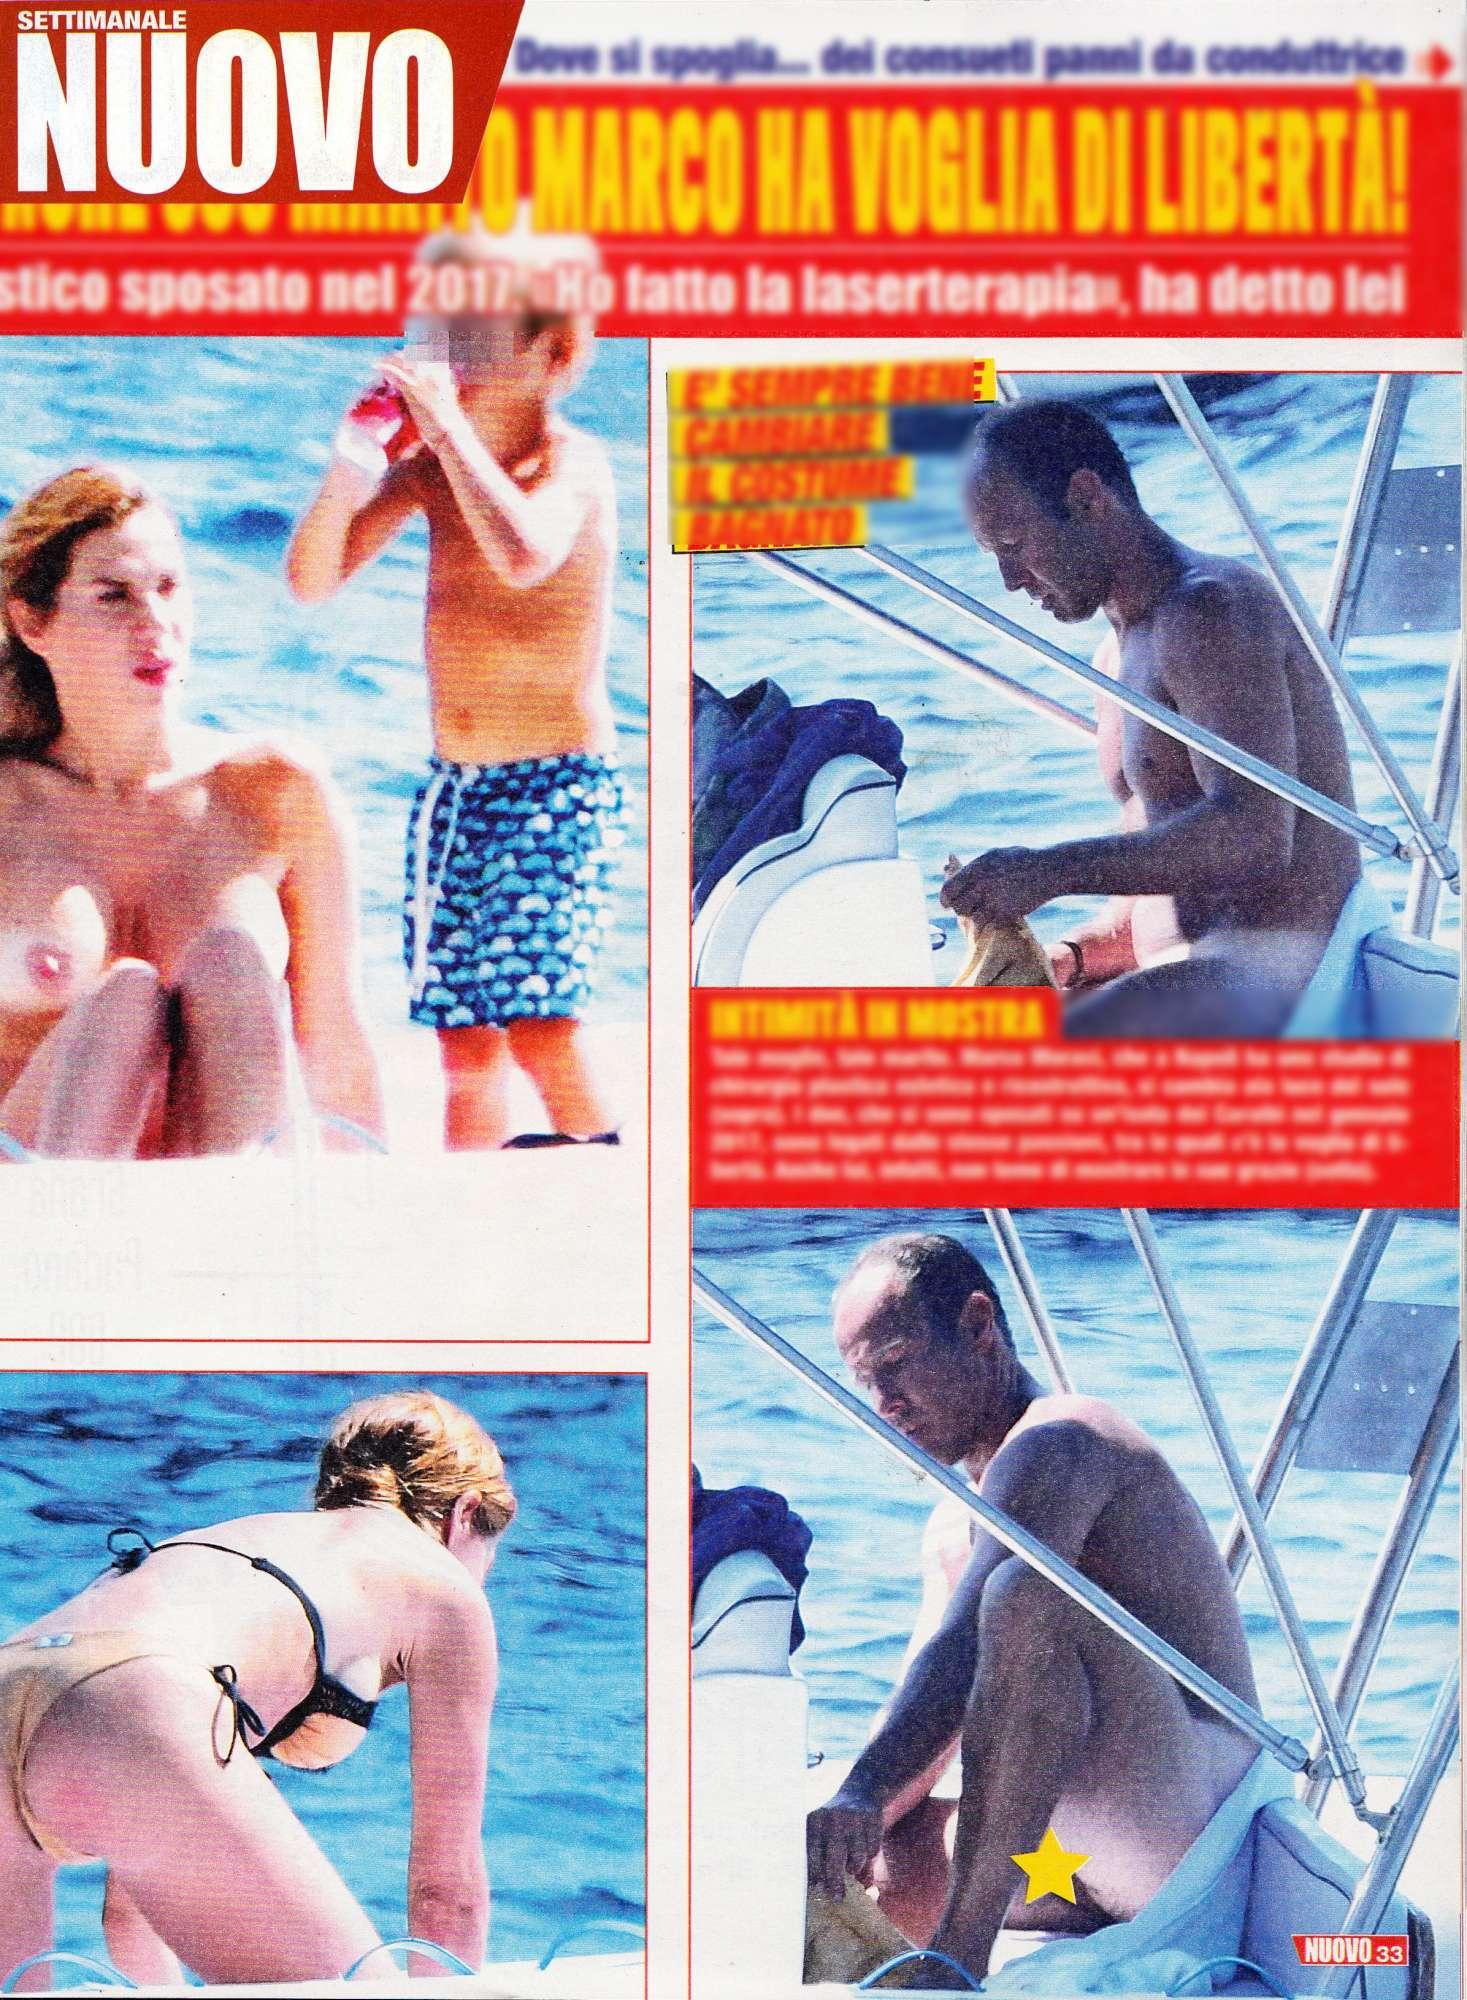 Veronica Maya, vacanze hot: lei in topless, il marito senza slip